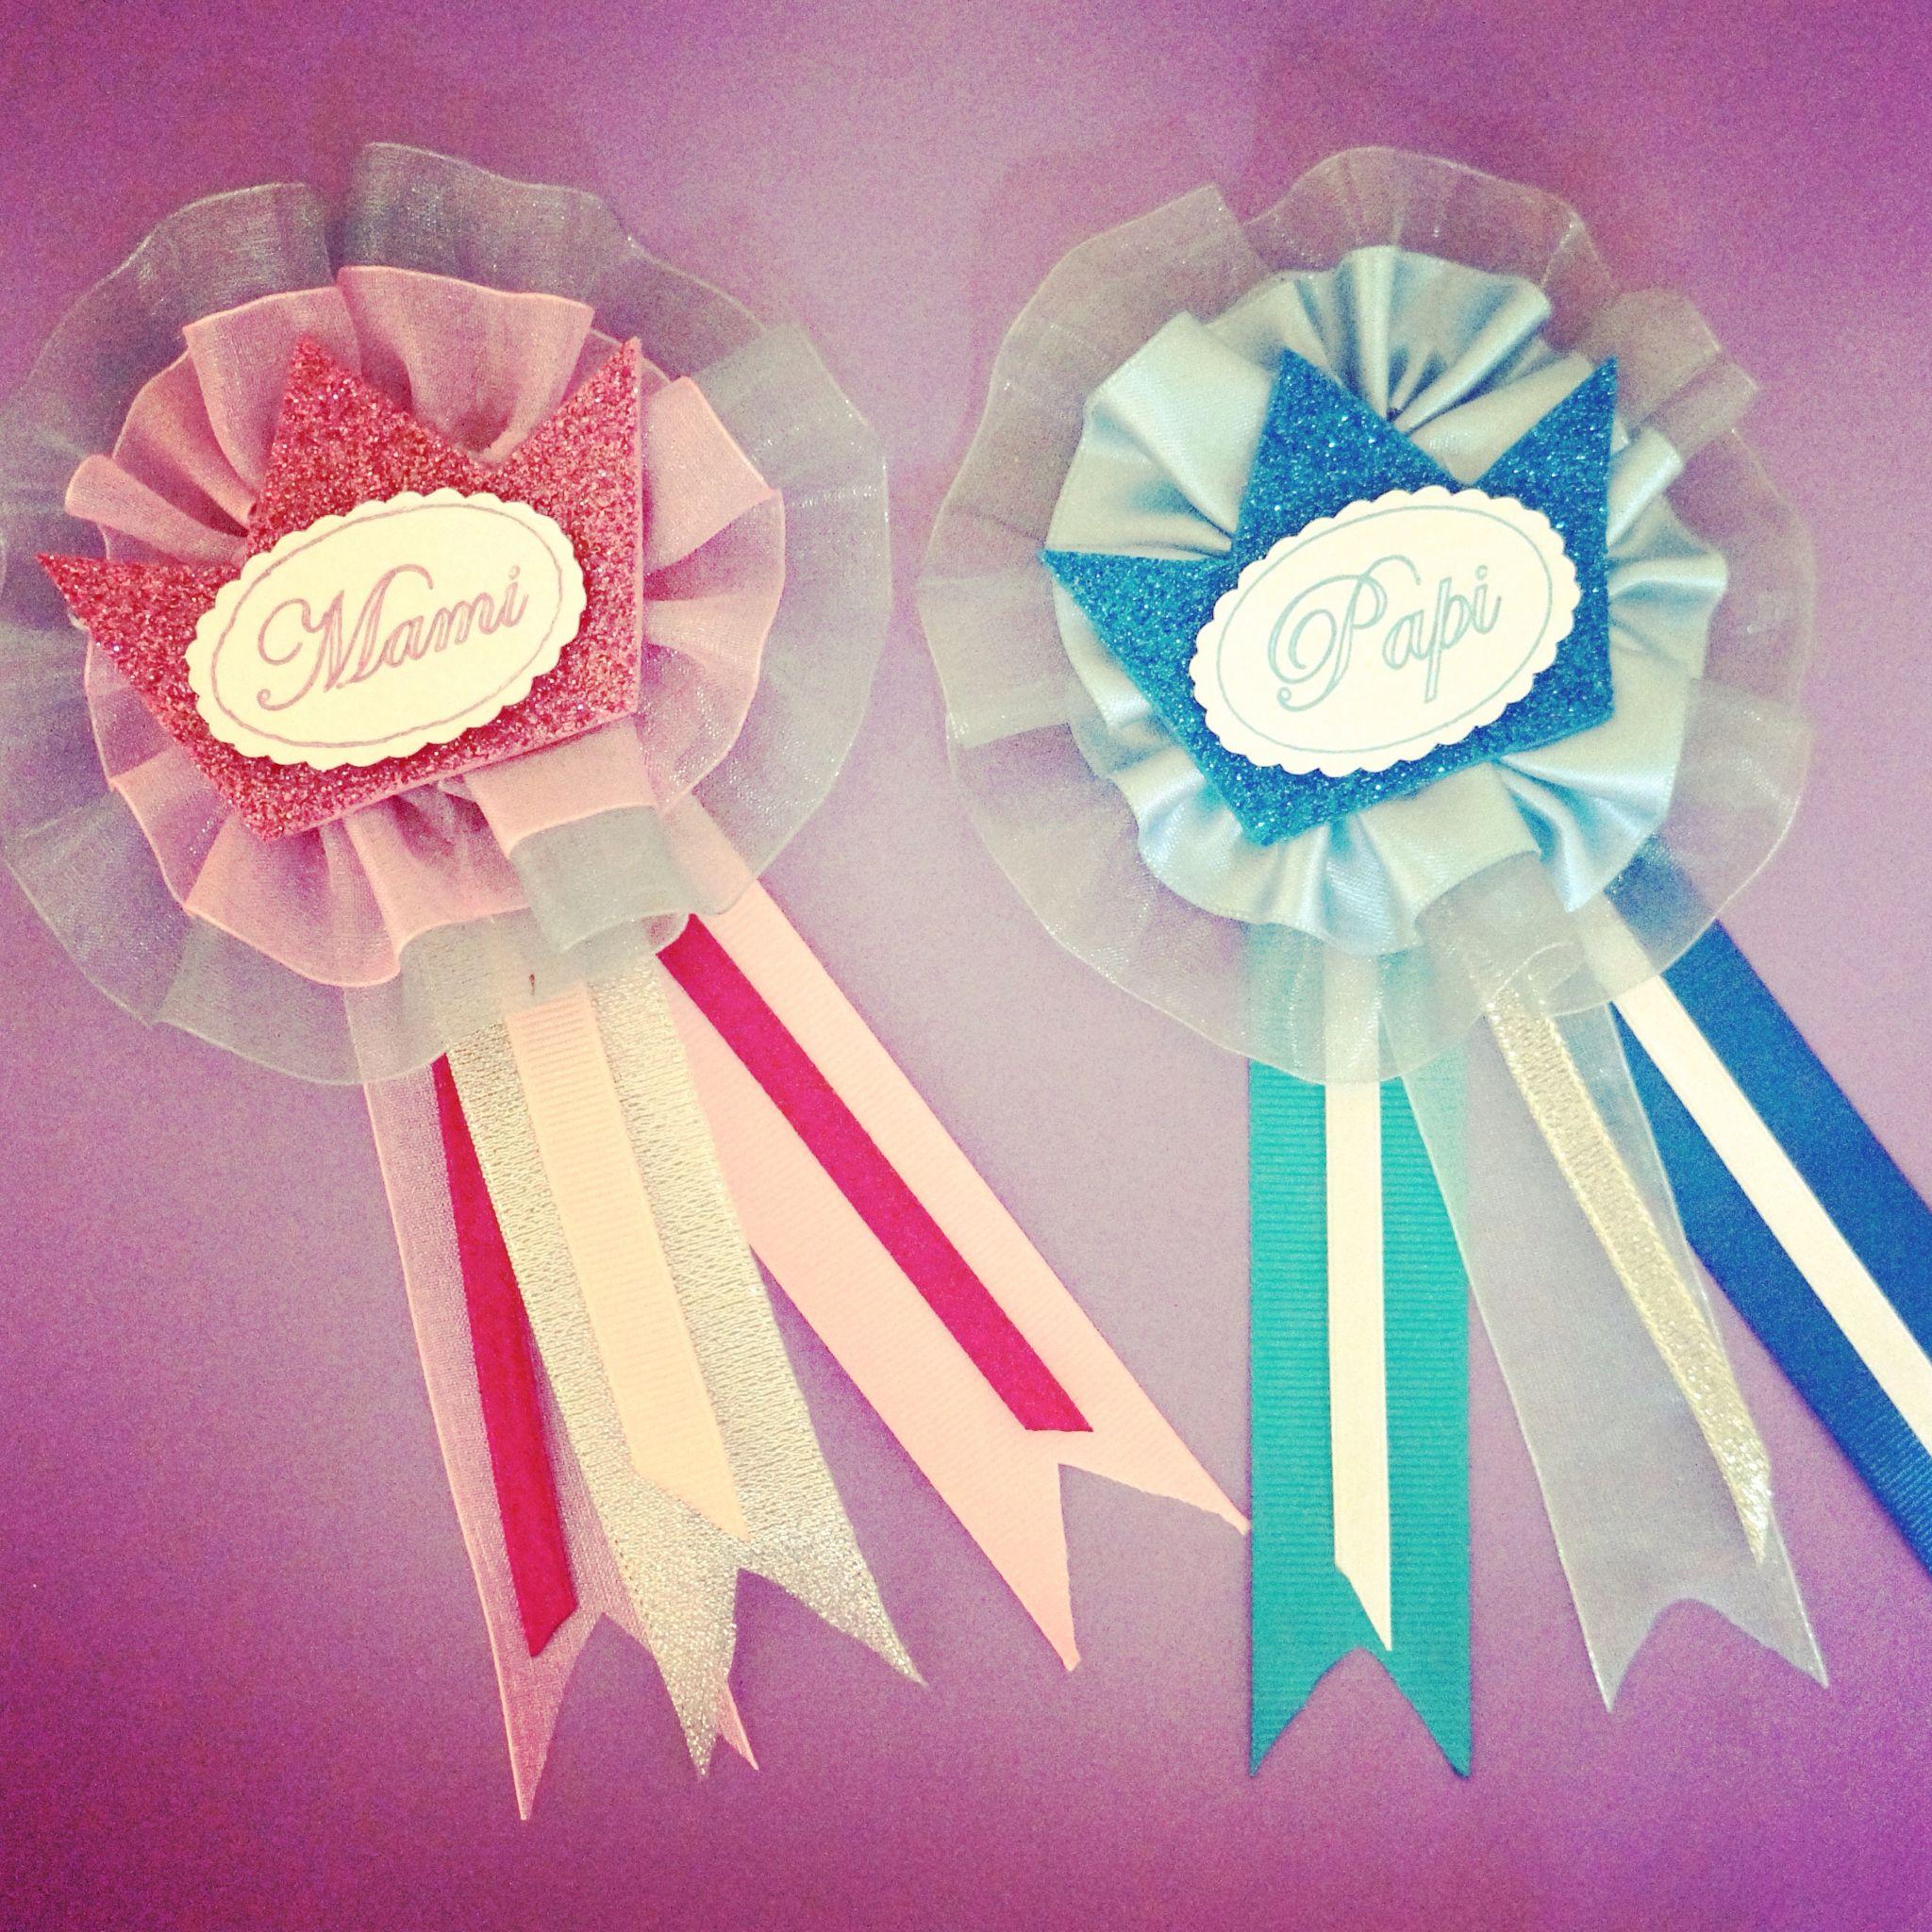 Distintivos Mami y Papi BabyShowerLP Princesa arttodeco